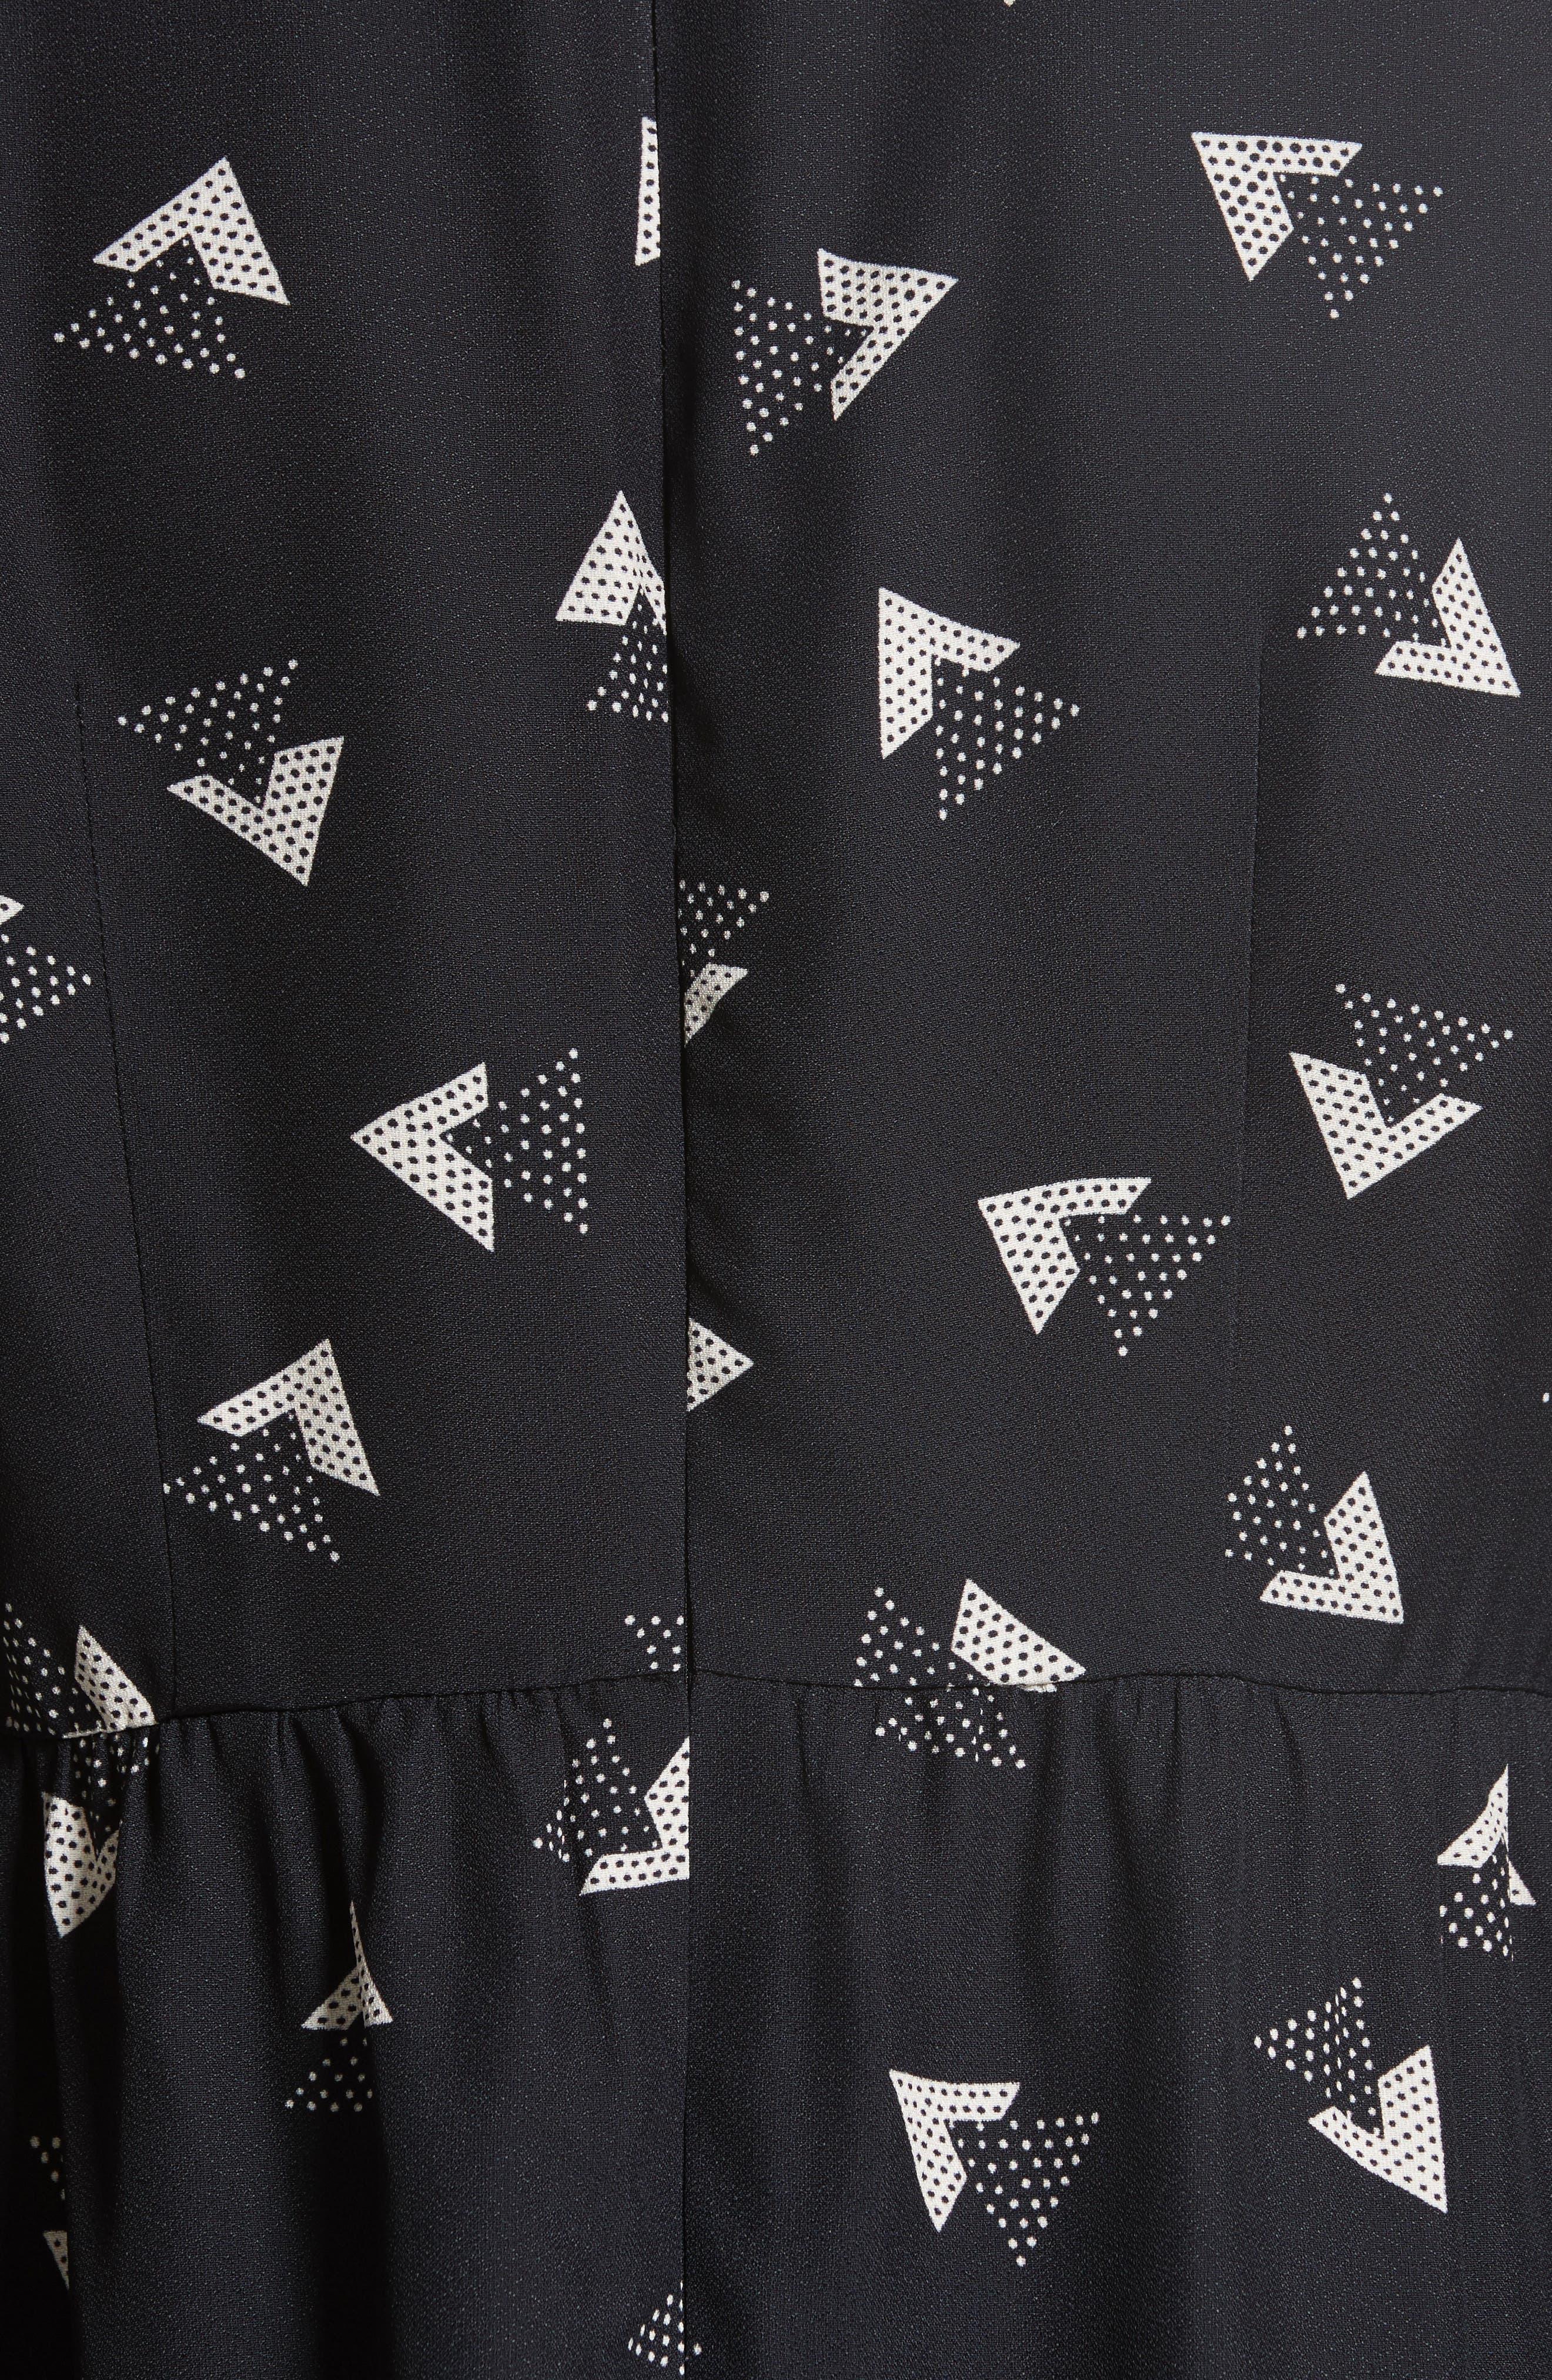 Geo Print Satin Back Crepe Dress,                             Alternate thumbnail 5, color,                             001